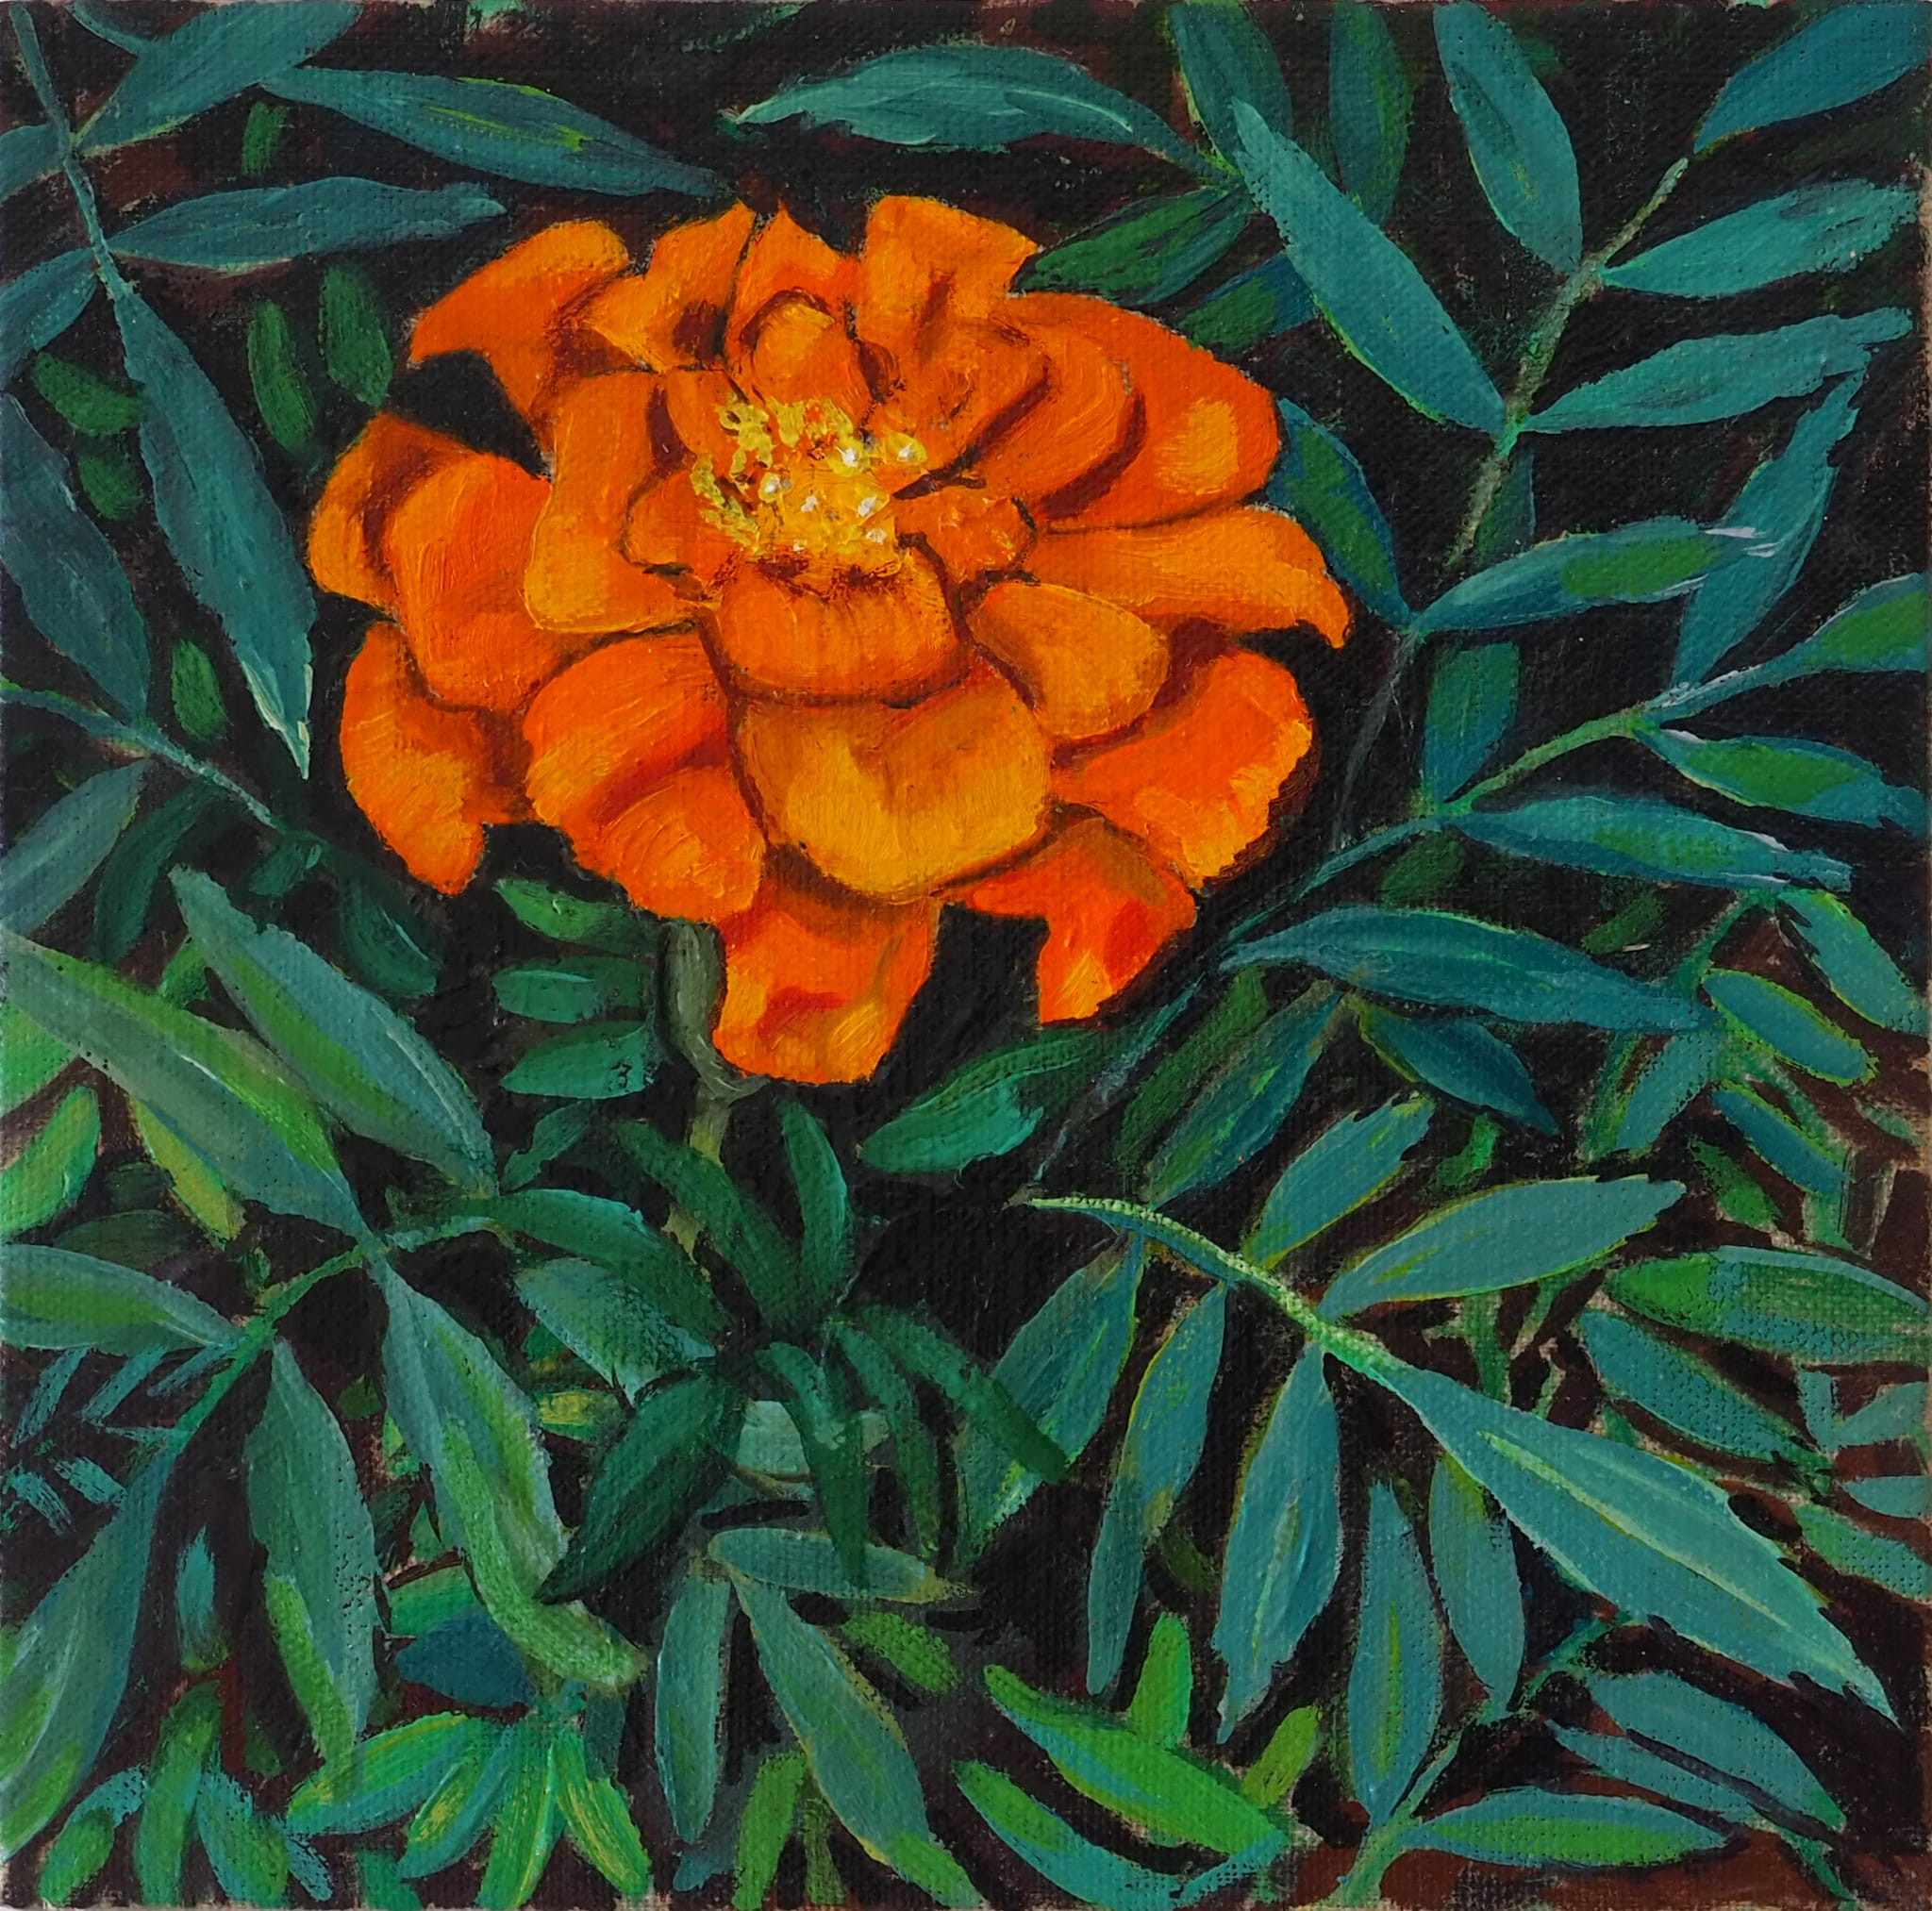 Tangerine Marigold 20x20cm oil on linen board $220 SOLD